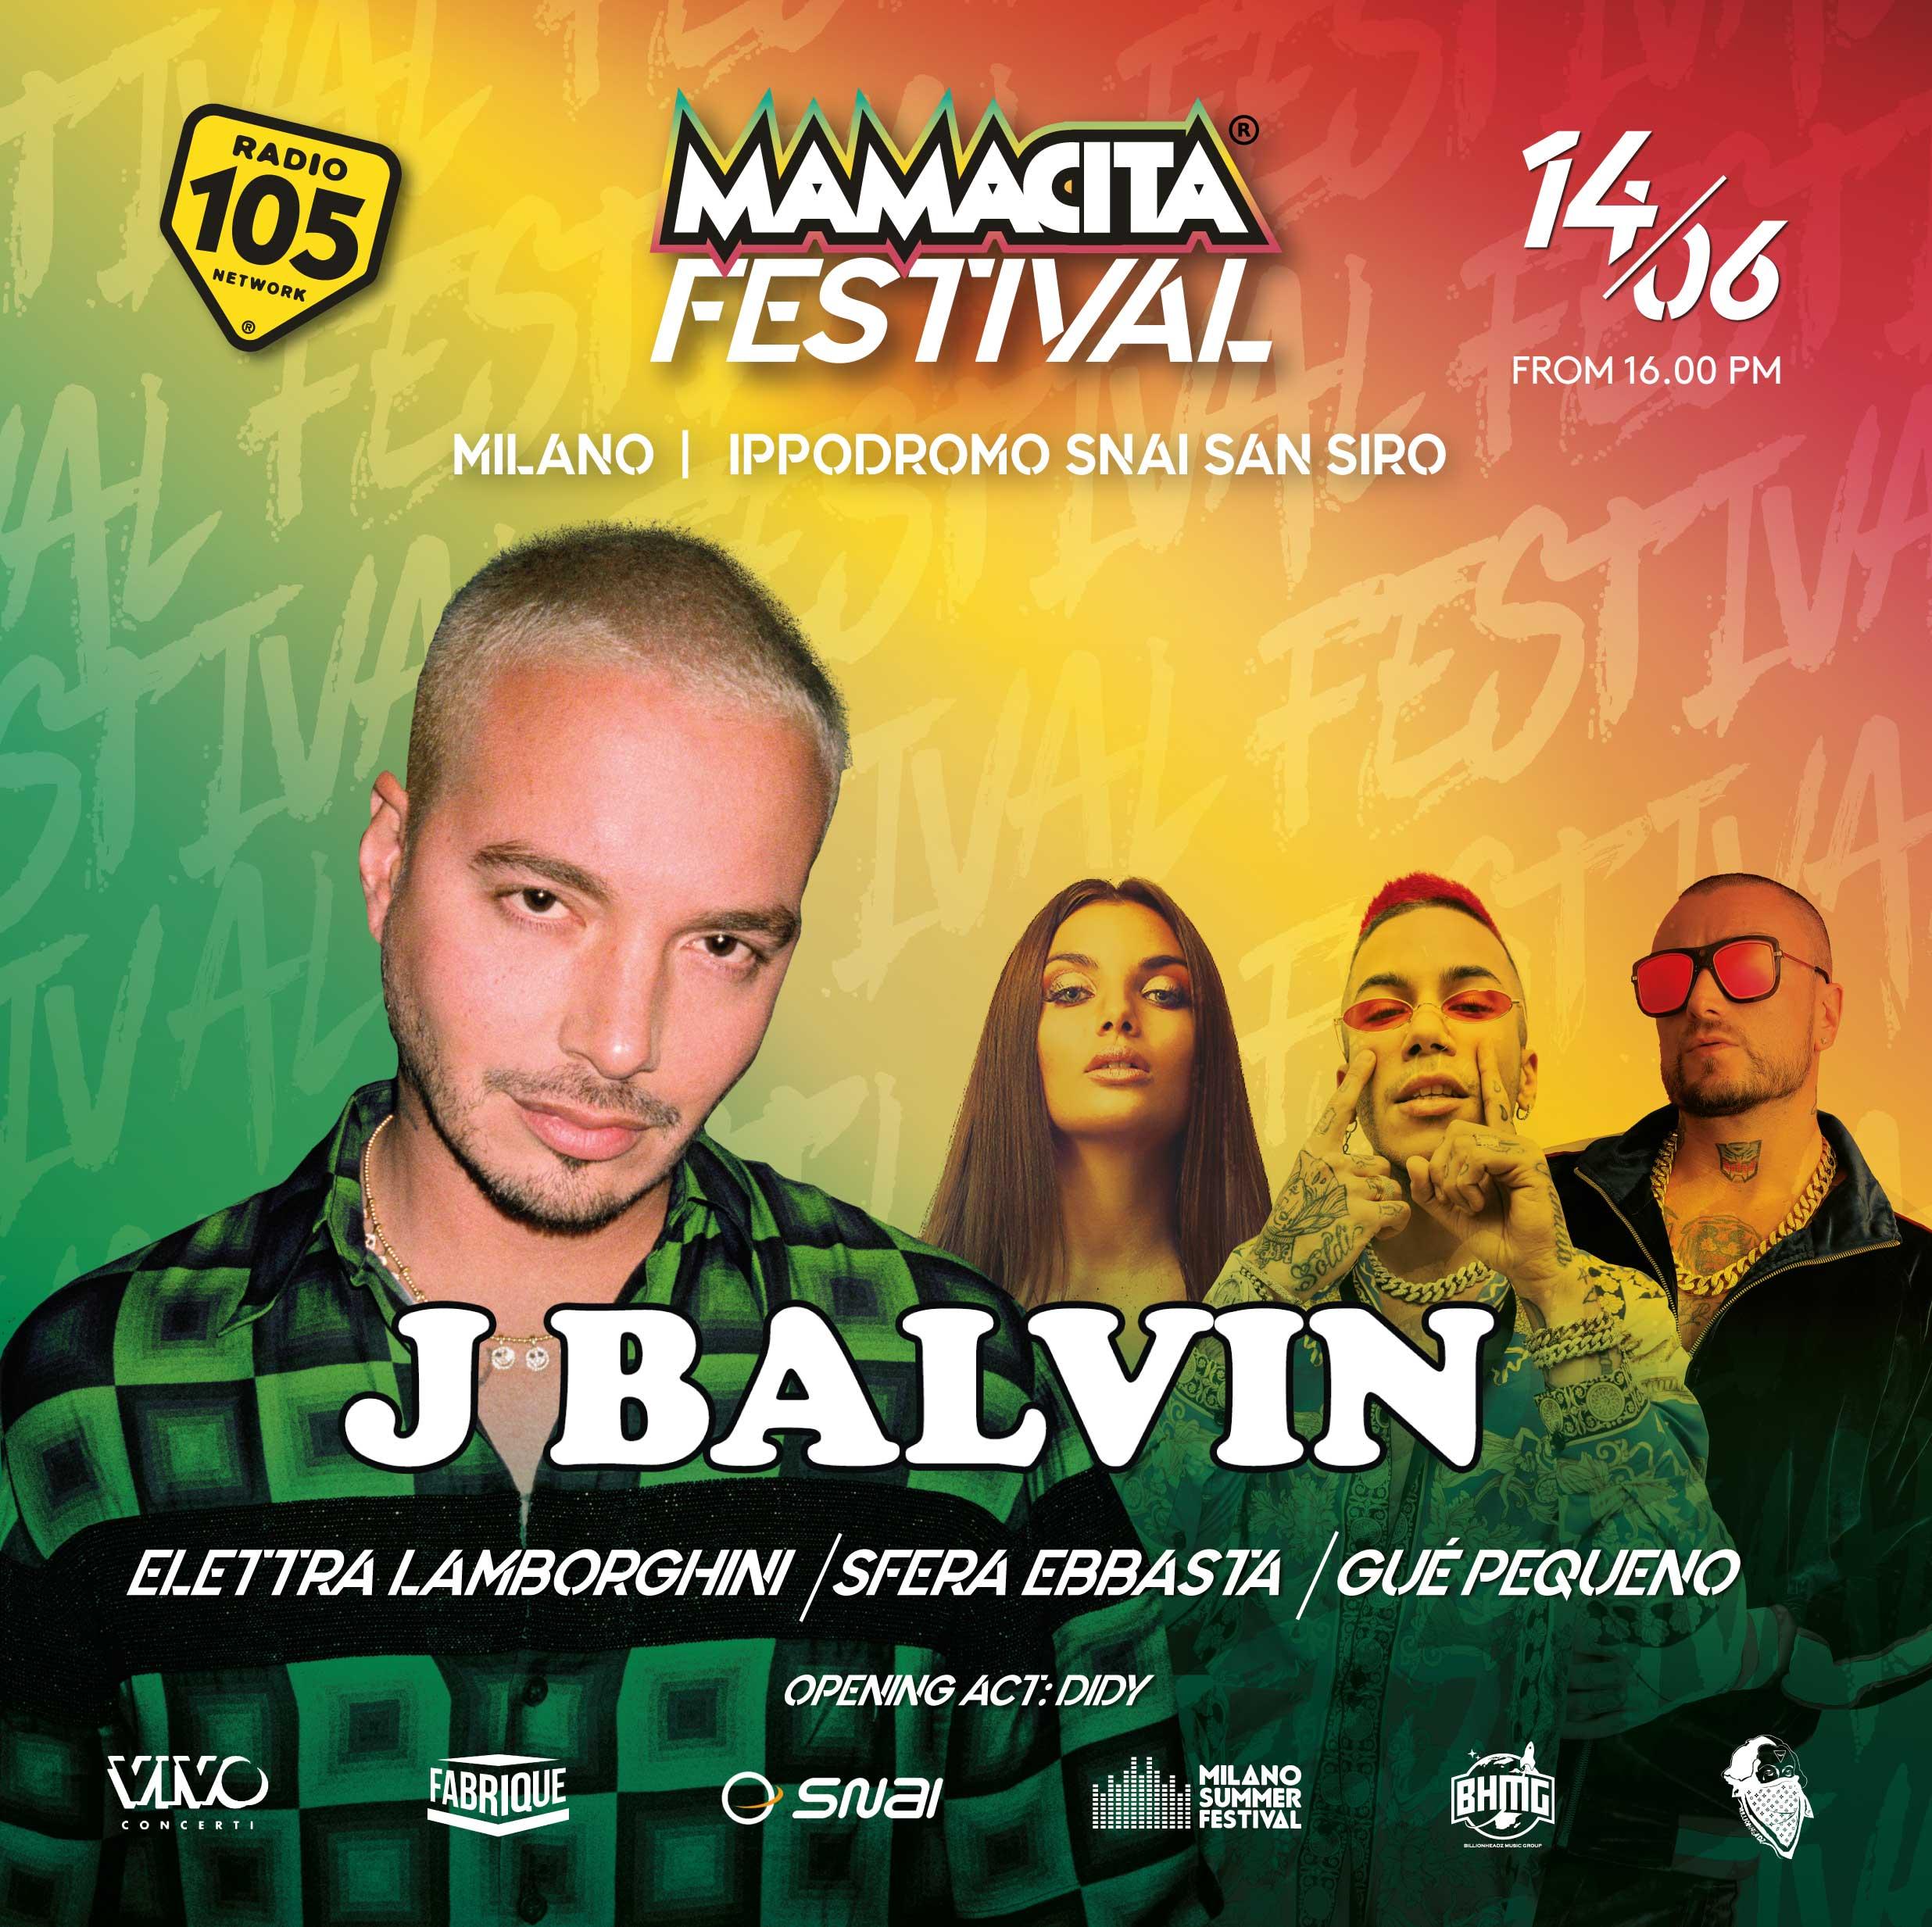 MAMACITA FESTIVAL – J. BALVIN and many more, 14 giugno